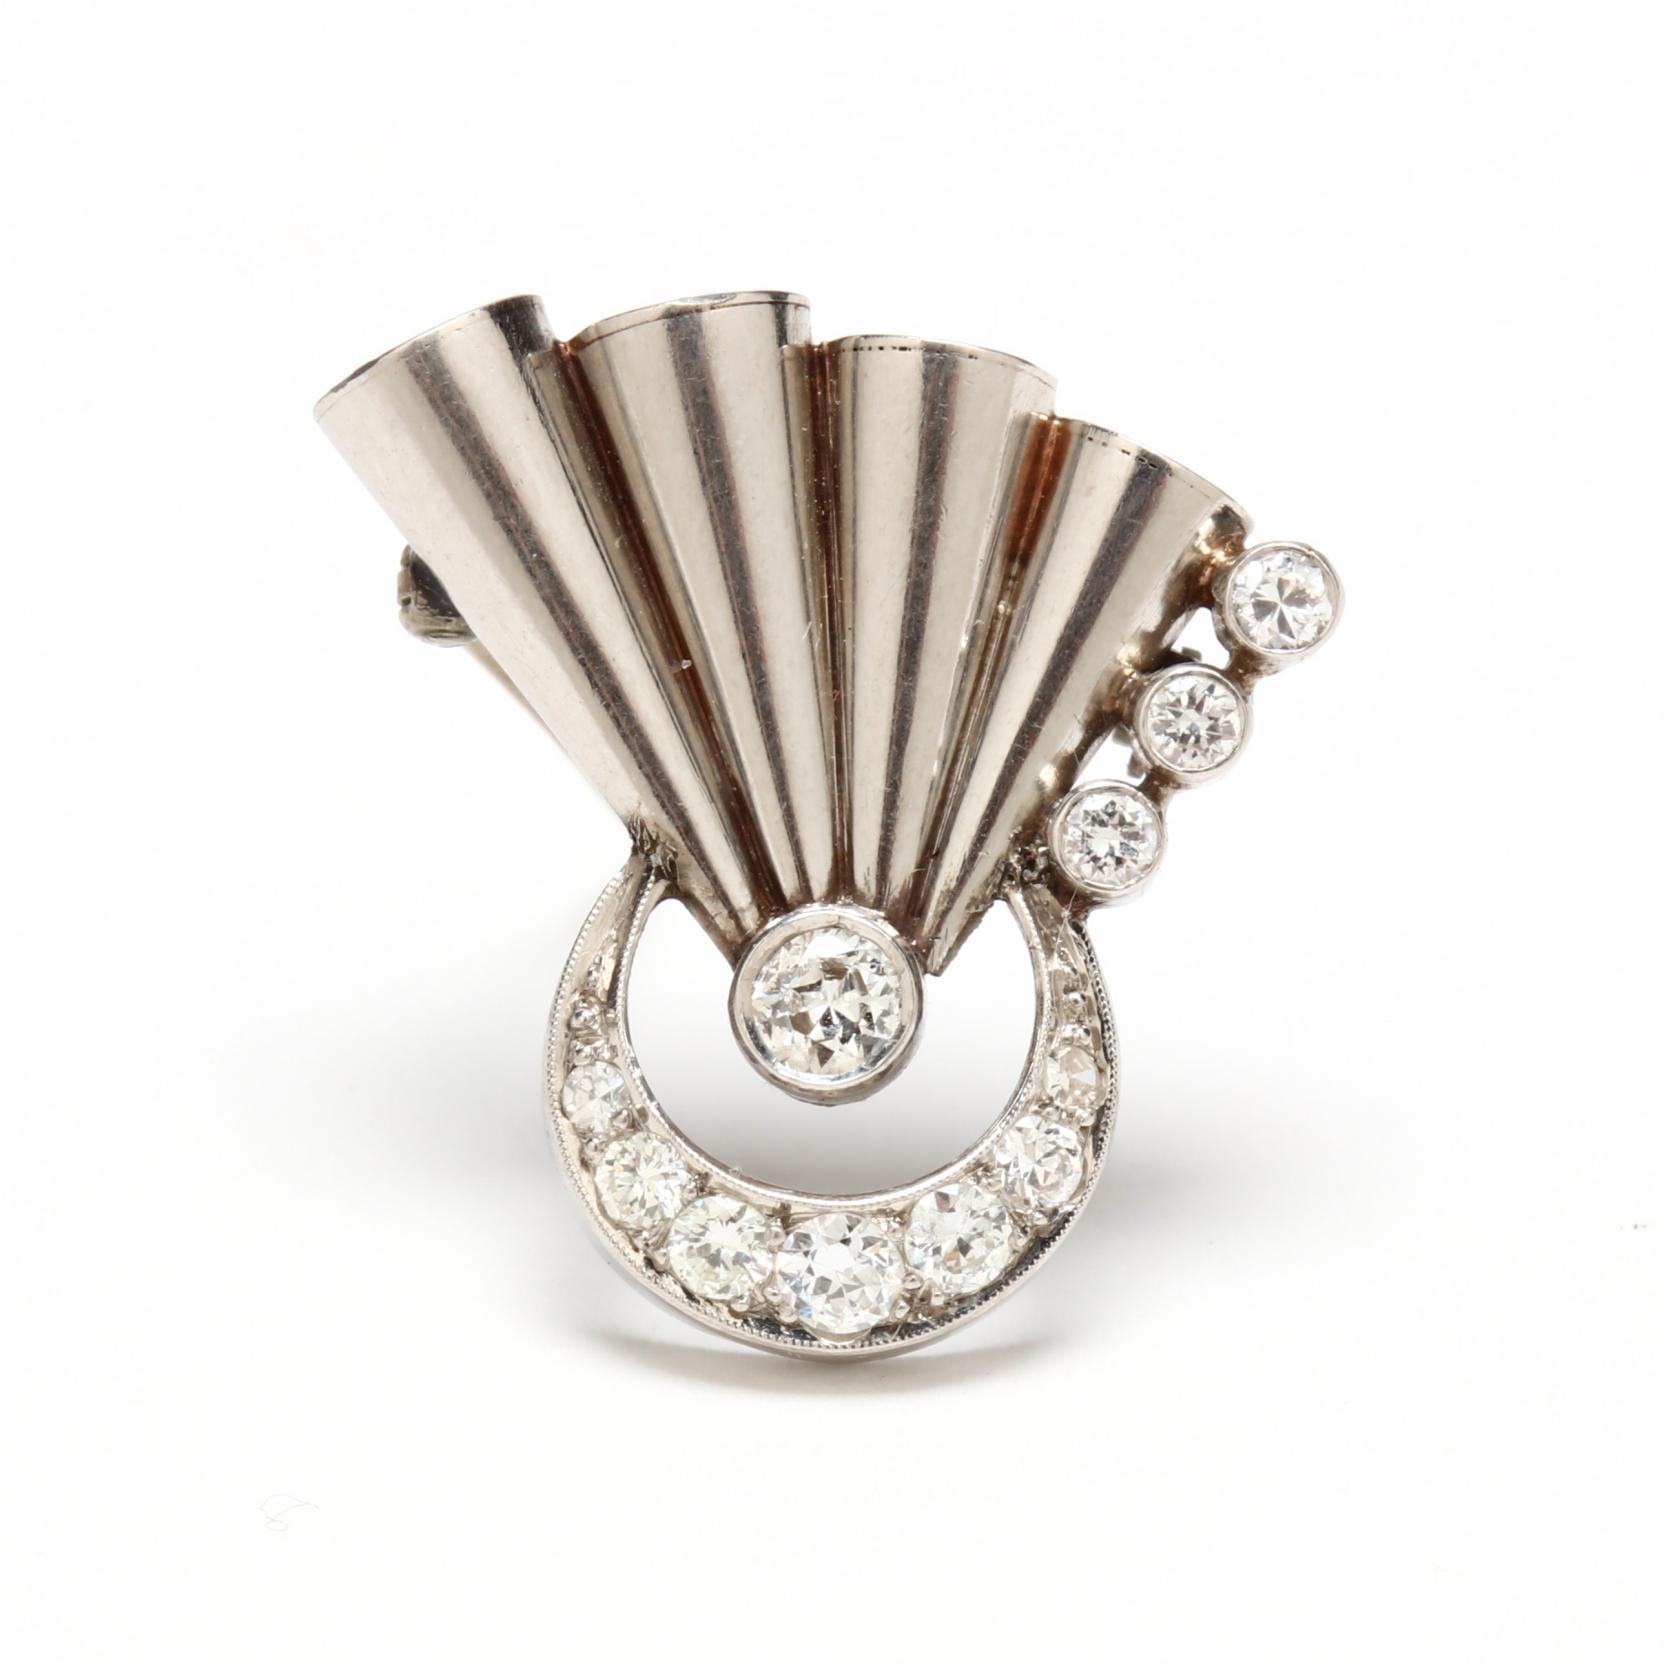 platinum-and-diamond-halley-s-comet-brooch